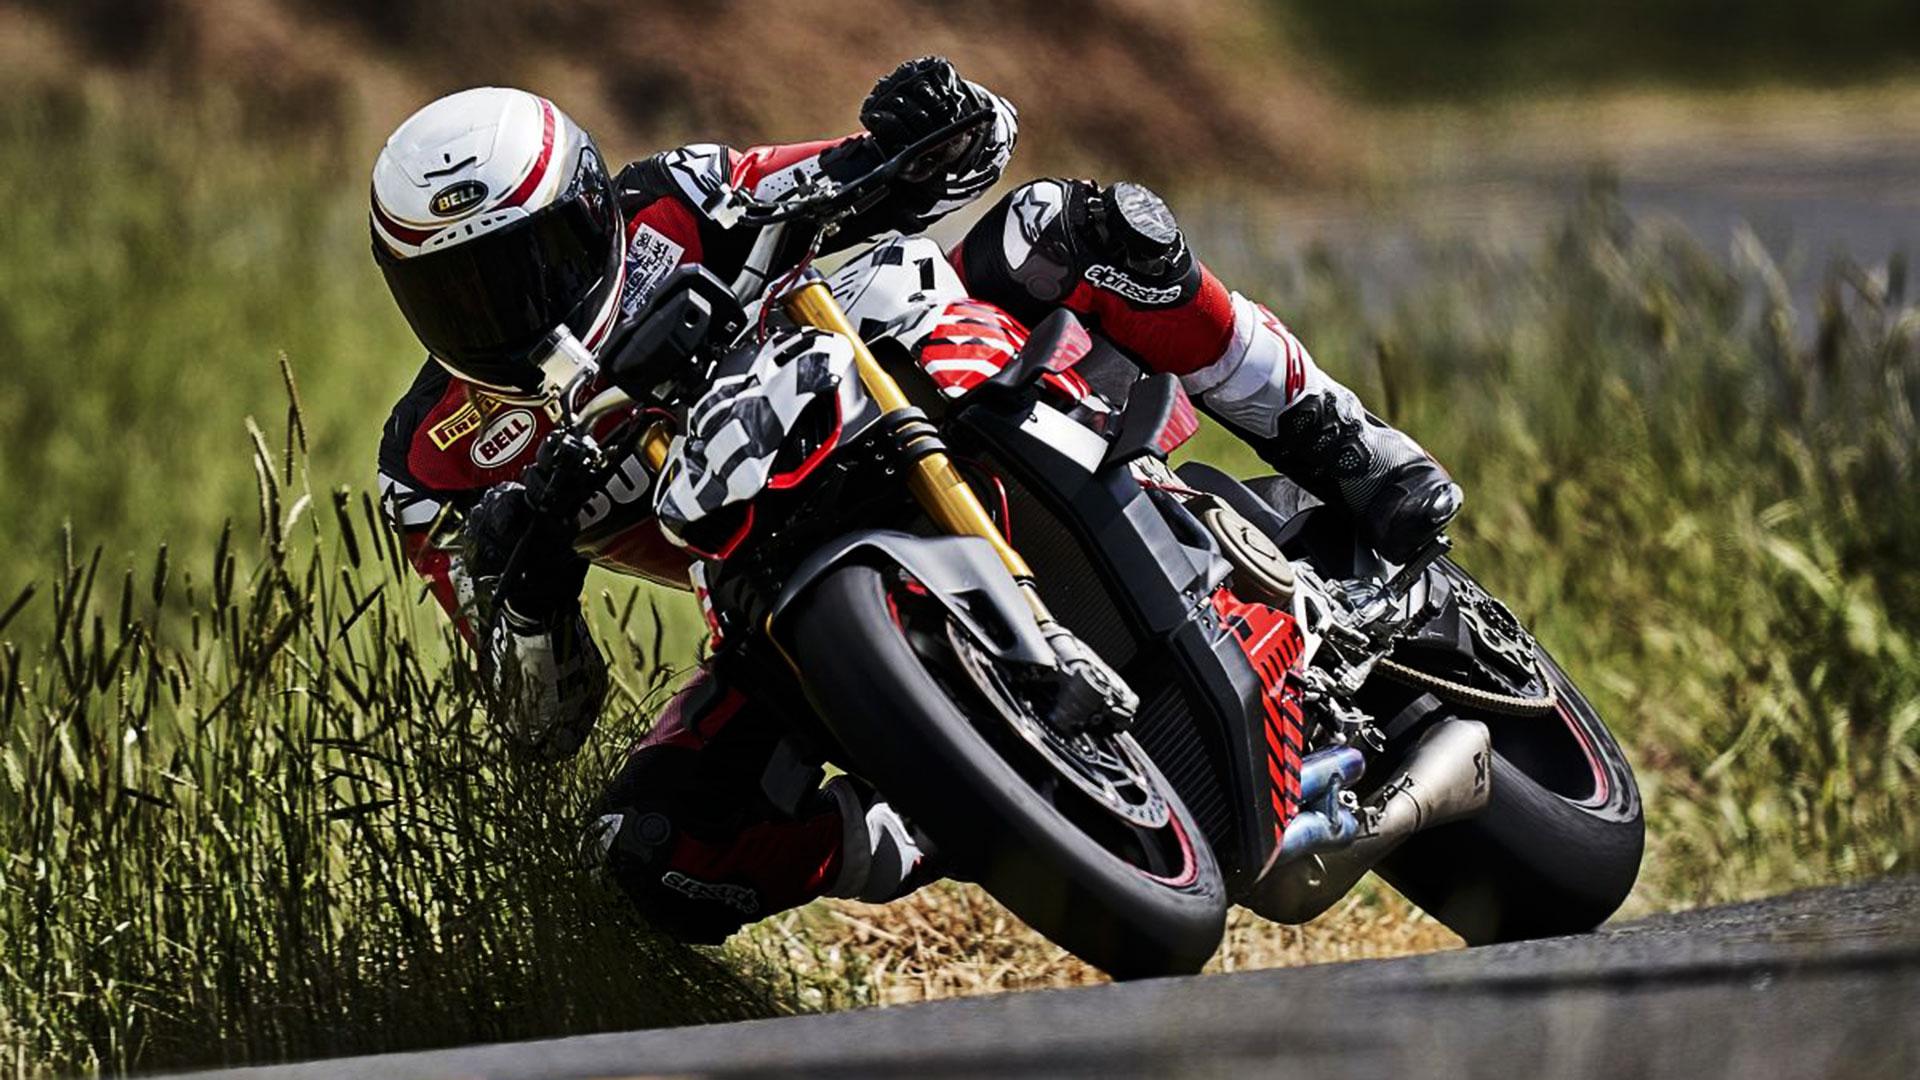 Ducati Streetfighter V4: nuda potenza alla Pikes Peak 2019